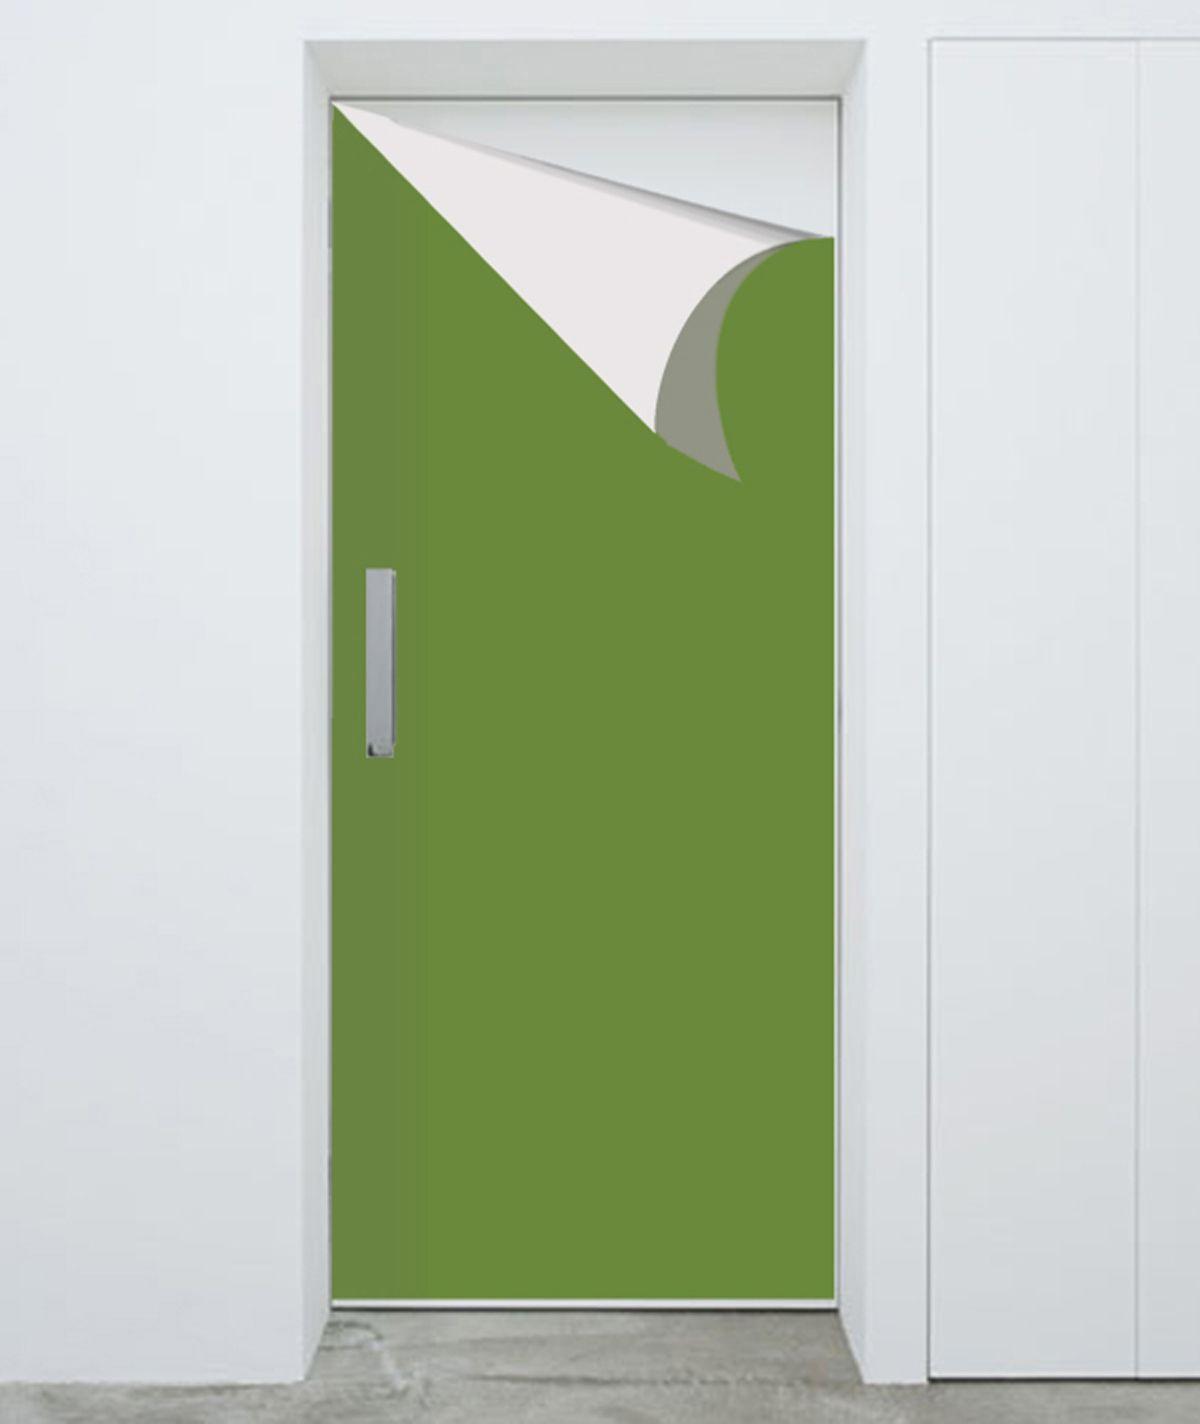 Diy Self Adhesive Plastic Sheets Home Remodeling Diy Interior Remodel Plastic Sheets